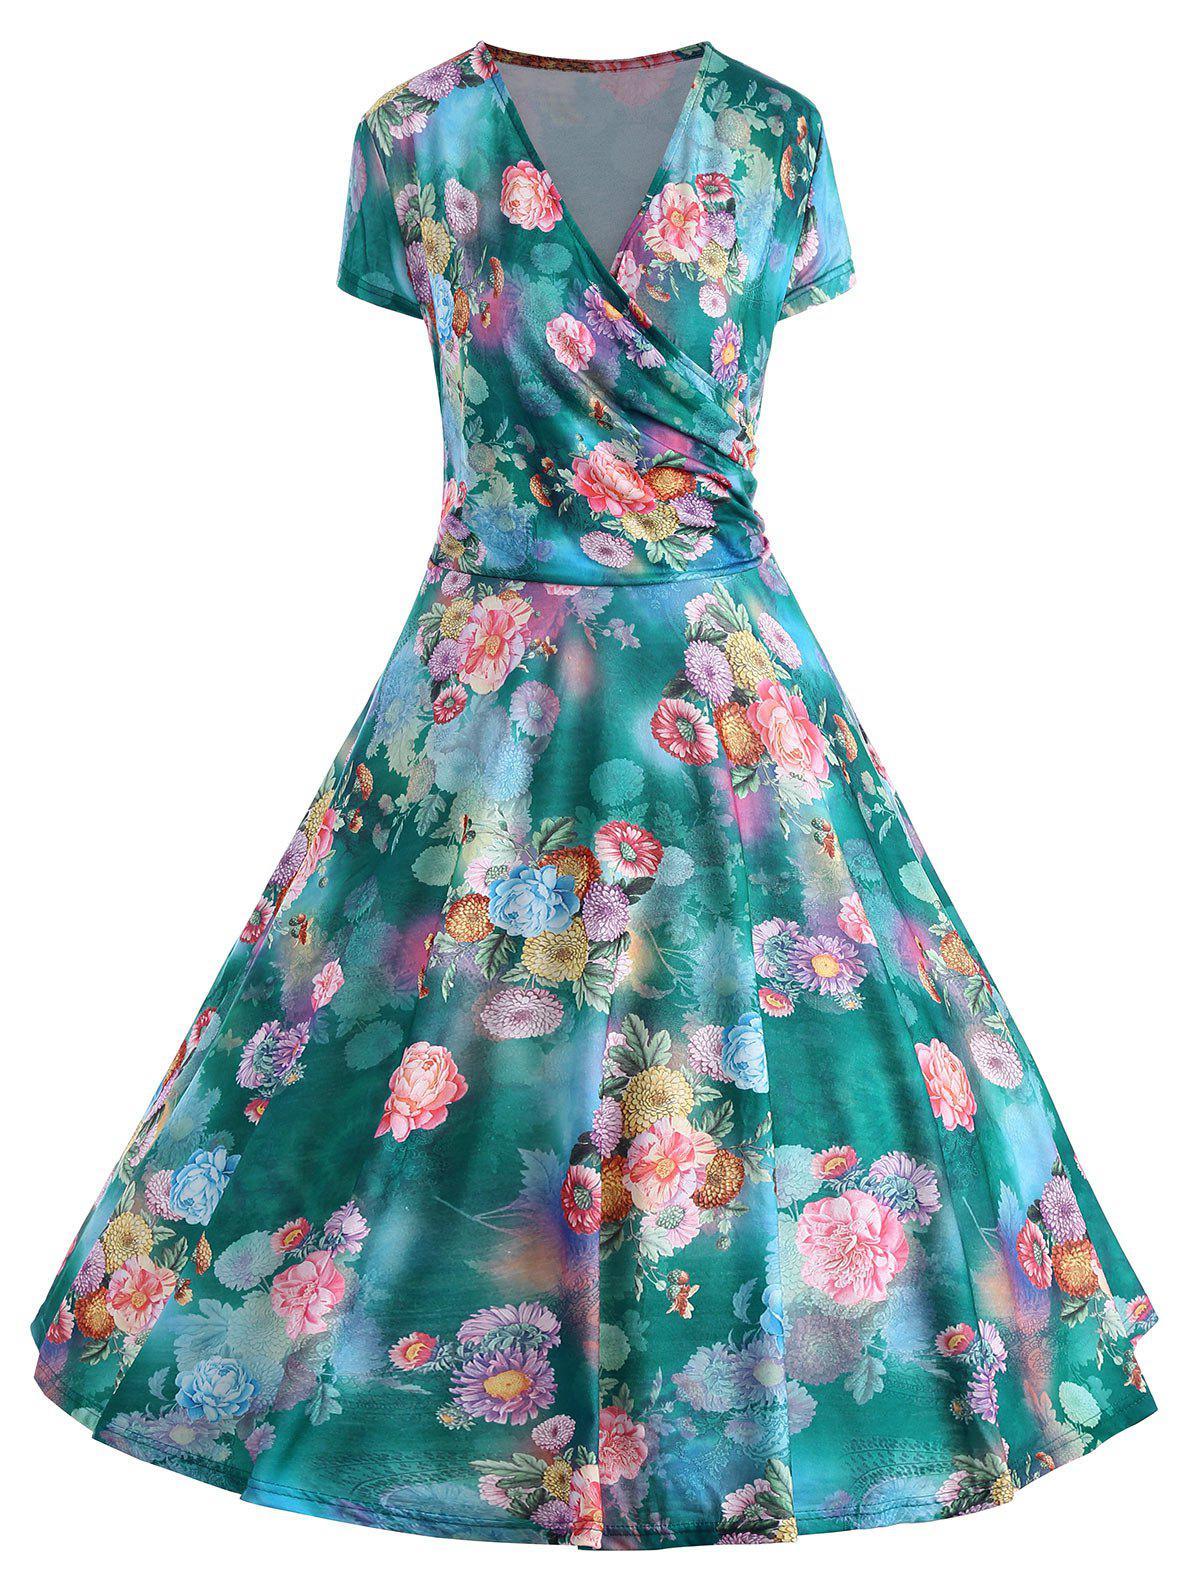 Plus Size Floral Print Pin Up Dress